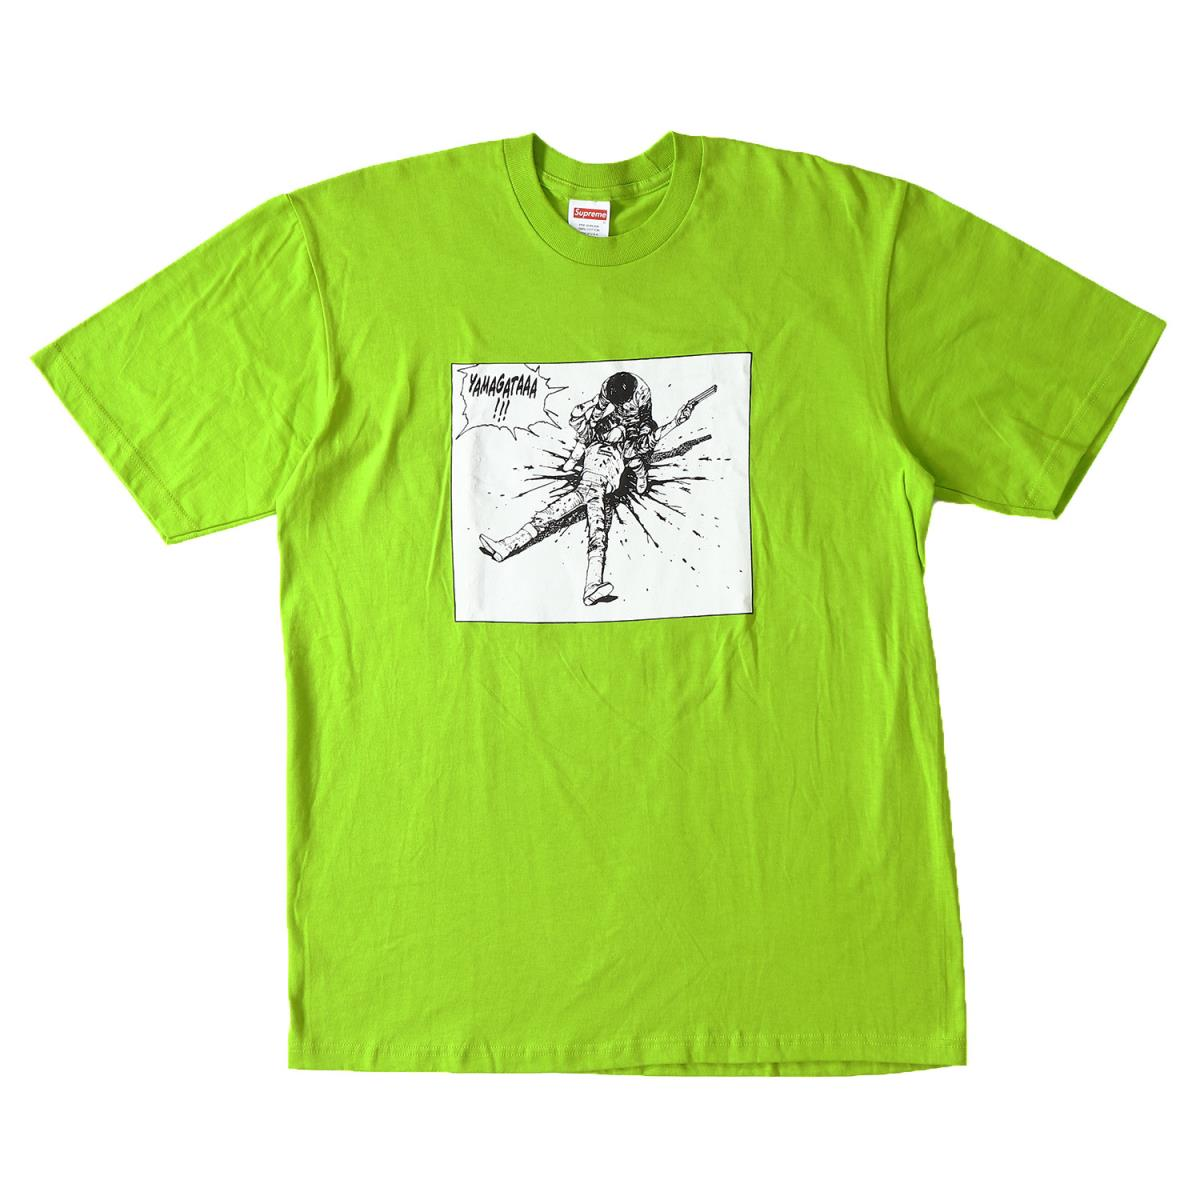 Supreme (シュプリーム) 17A/W ×AKIRA 山形Tシャツ(Yamagata Tee) ライム L 【メンズ】【K2055】【あす楽☆対応可】